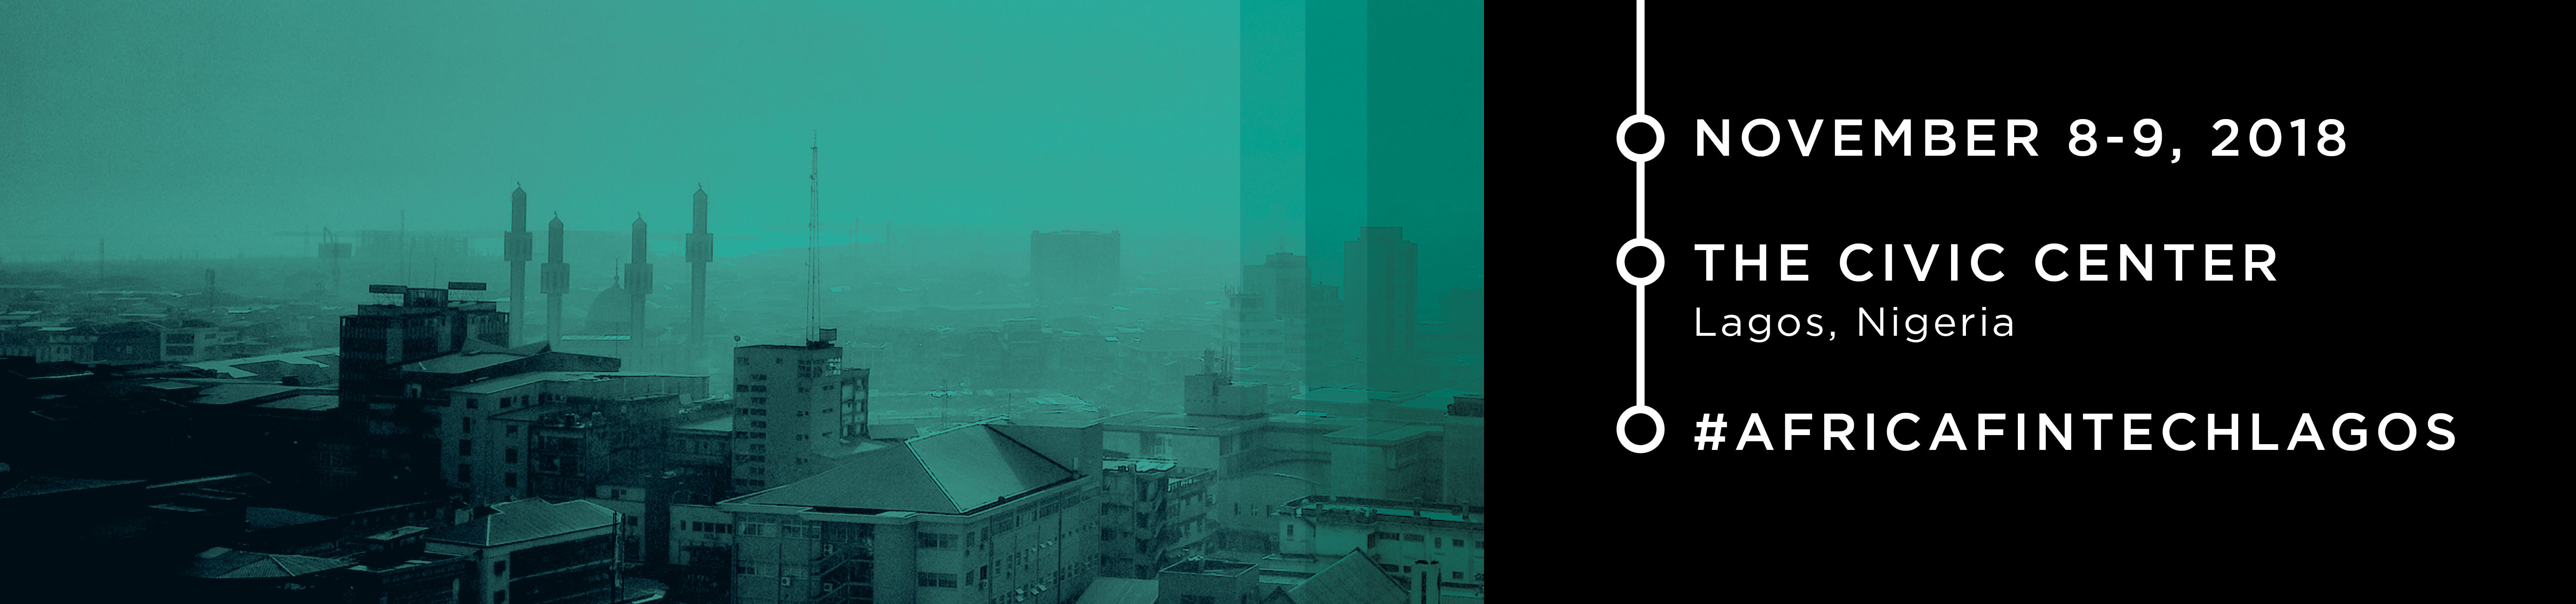 Africa Fintech Summit – Lagos 2018